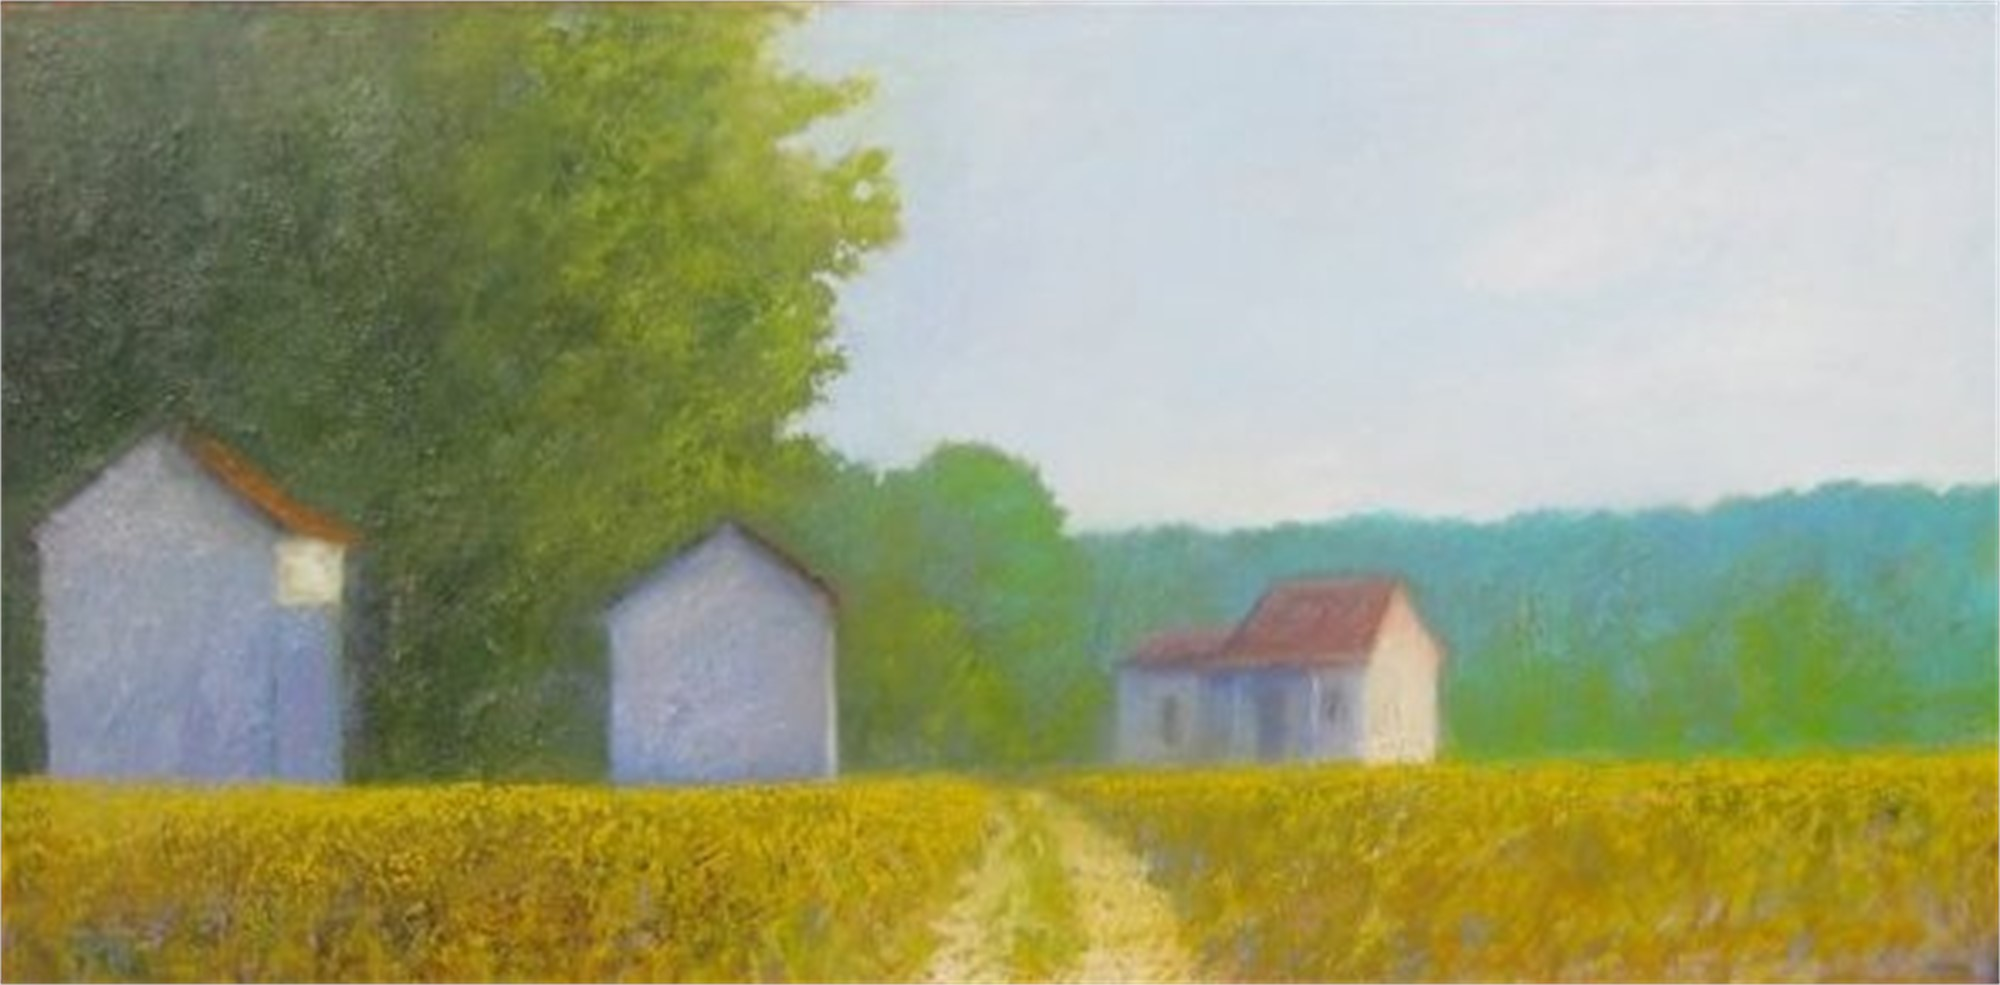 Farm Buildings in Afternoon Sun by John Gaitenby